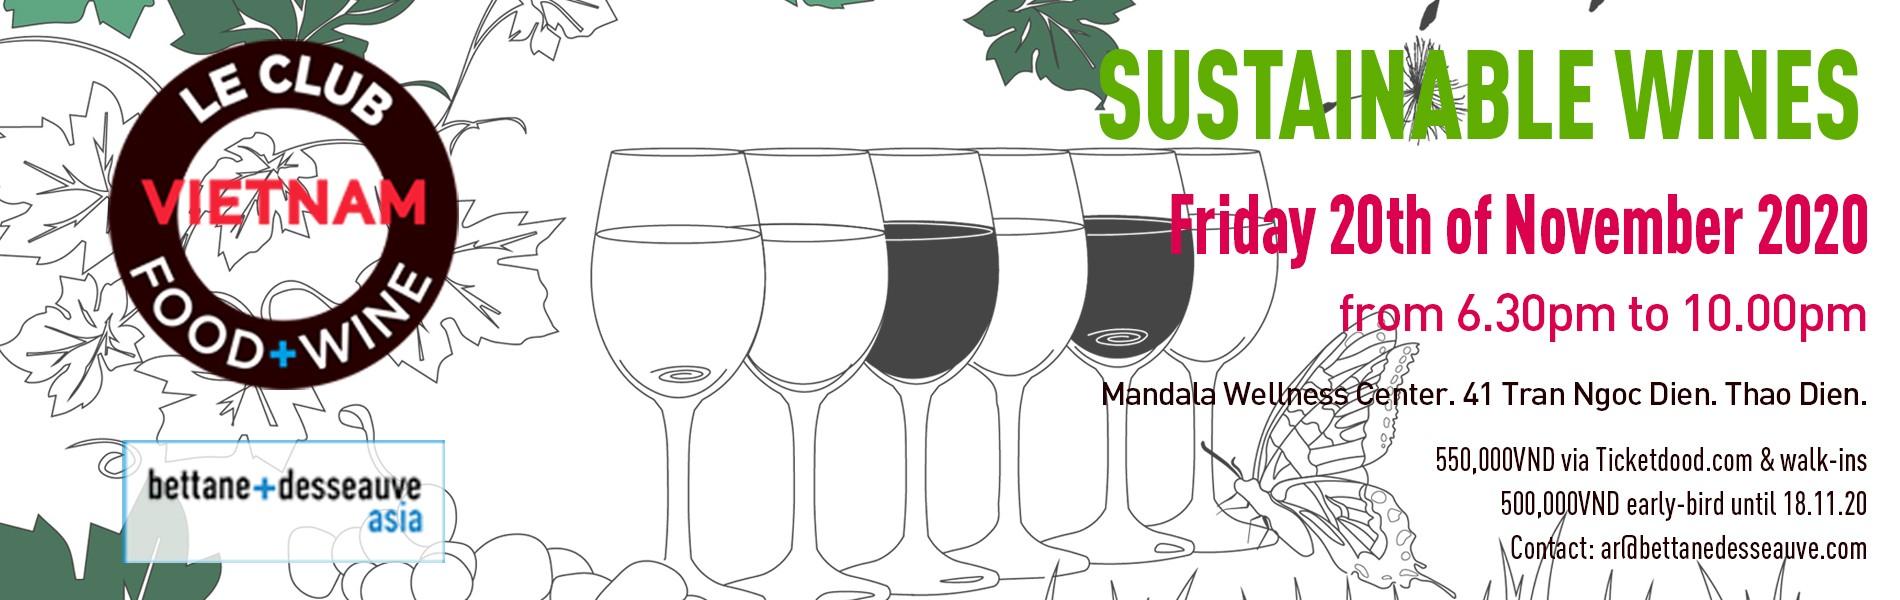 Le Club Food & Wine - Sustainable Wines Pop-Up Market